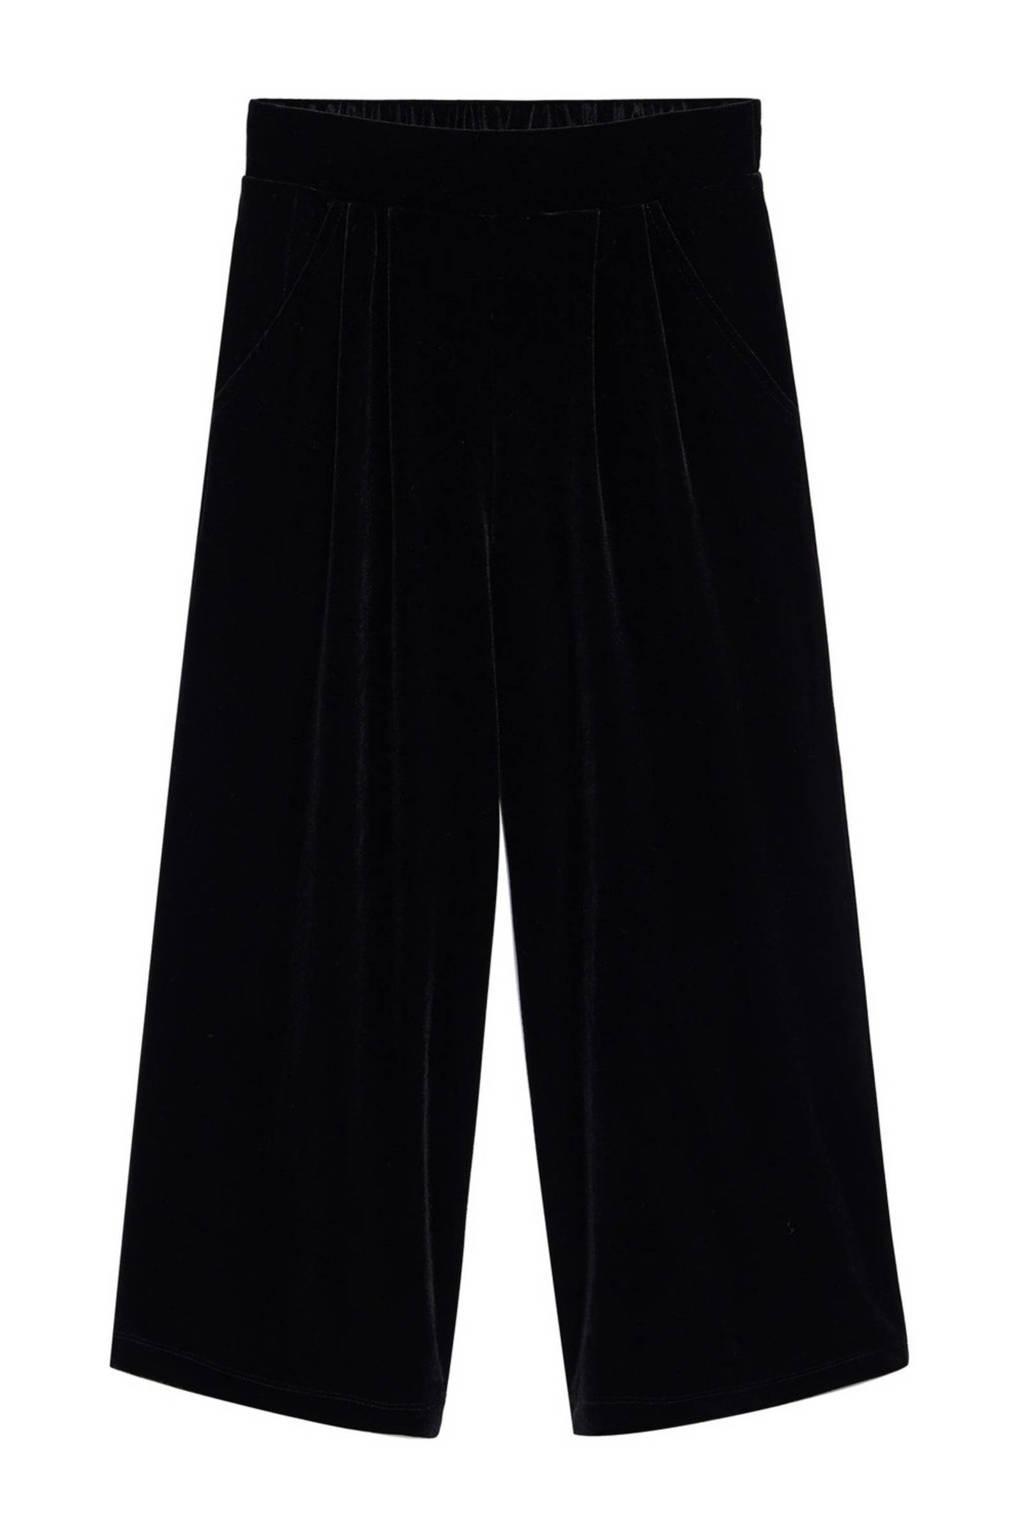 Mango Kids fluwelen cropped broek zwart, Zwart